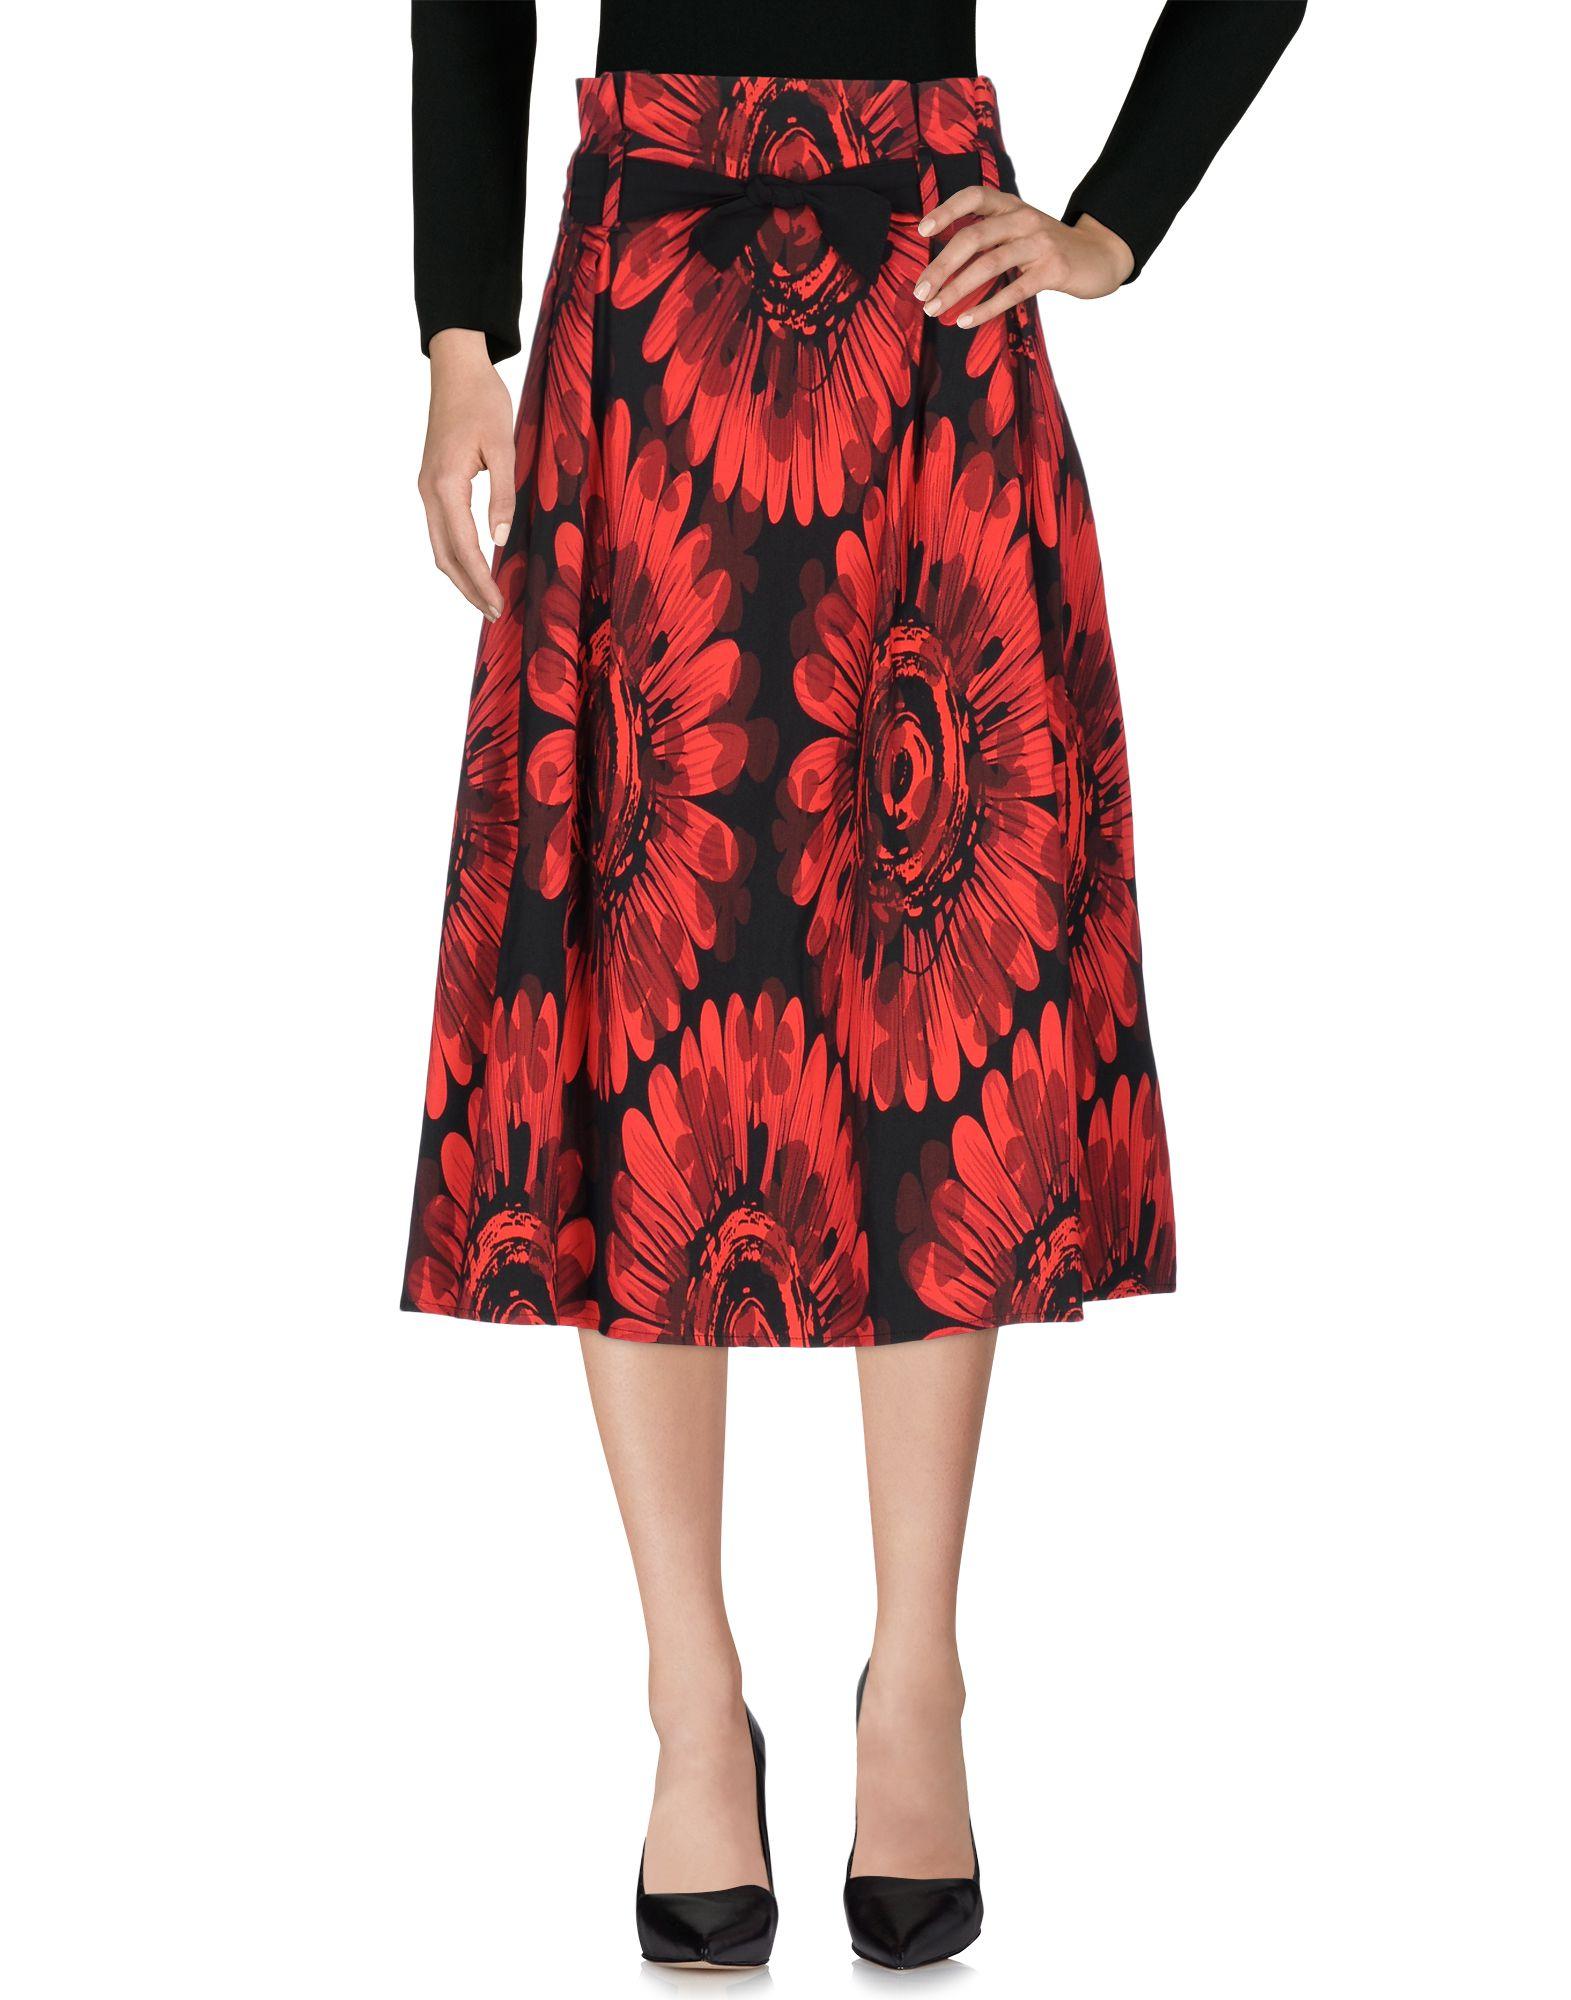 Tadaski 3/4 Length Skirts